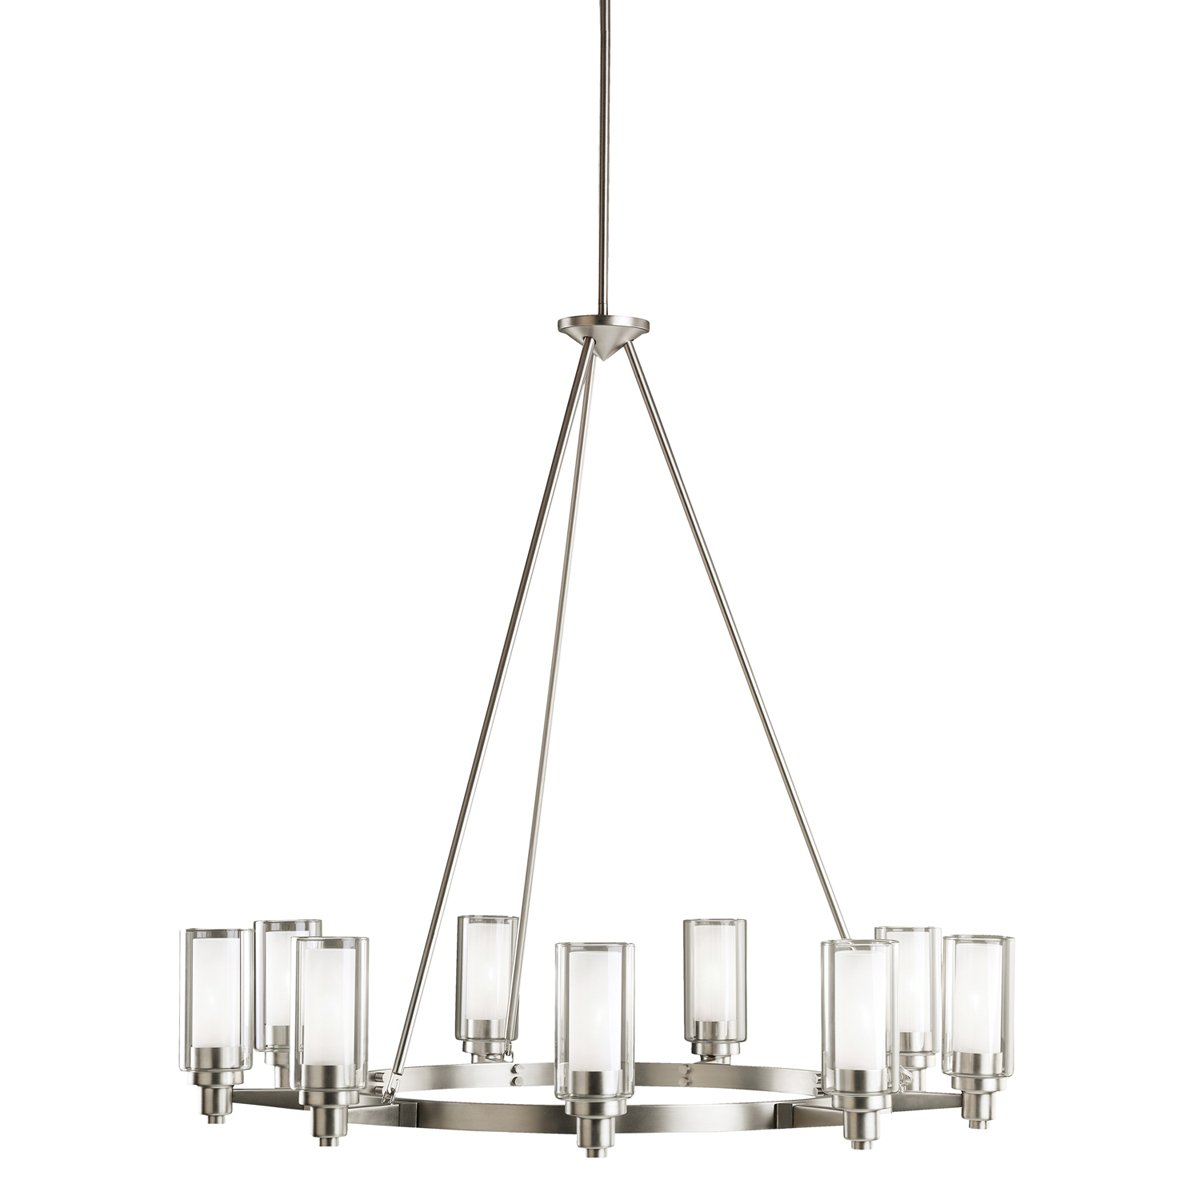 Kichler 2346ni nine light chandelier warehouse deals amazon aloadofball Choice Image